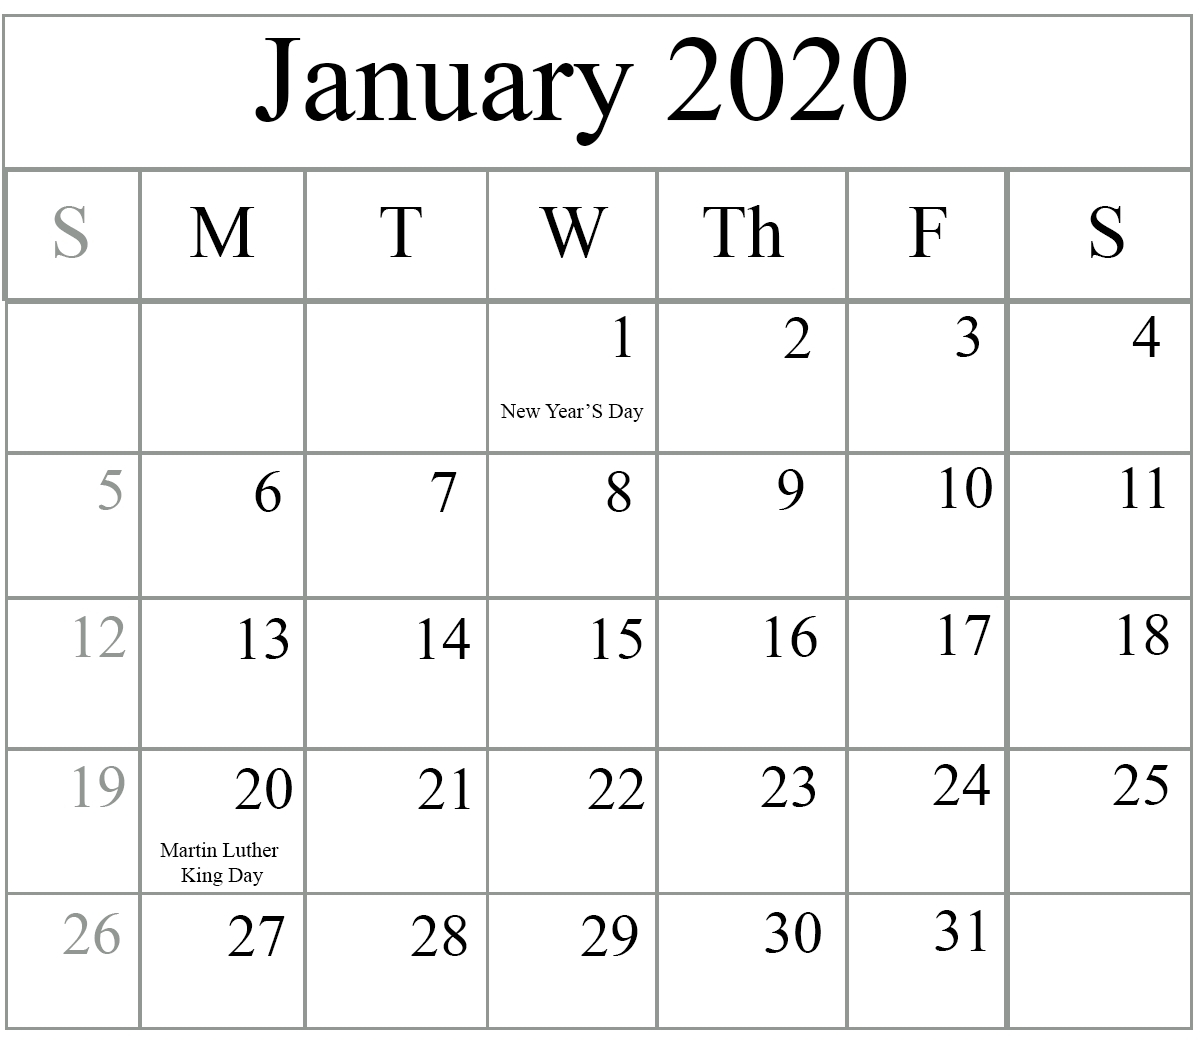 Blank 2020 Calendars To Edit - Calendar Inspiration Design Free Calendars To Download And Edit